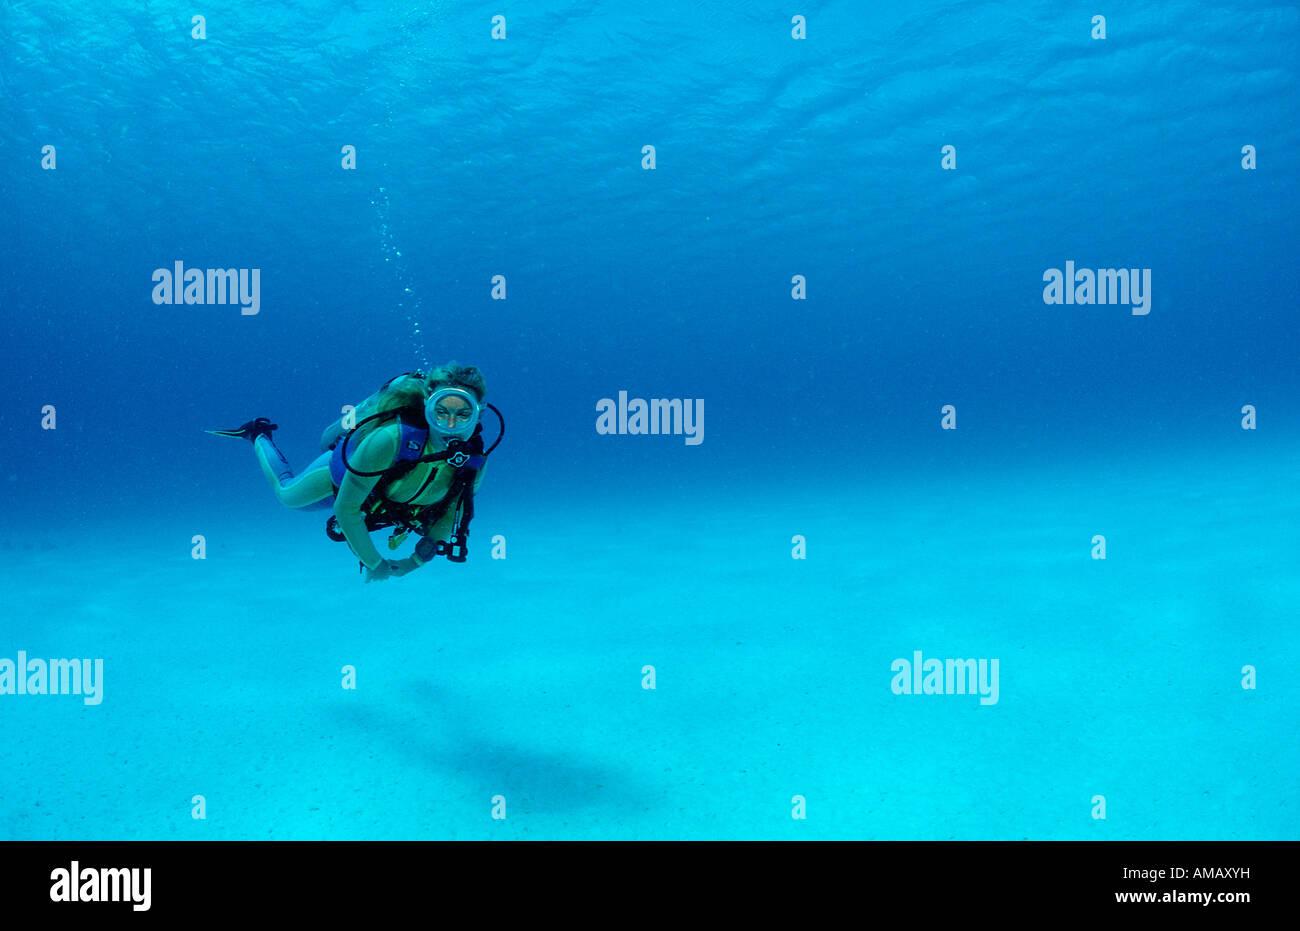 Scuba Diver Antille Olandesi Bonaire Mar dei Caraibi Immagini Stock